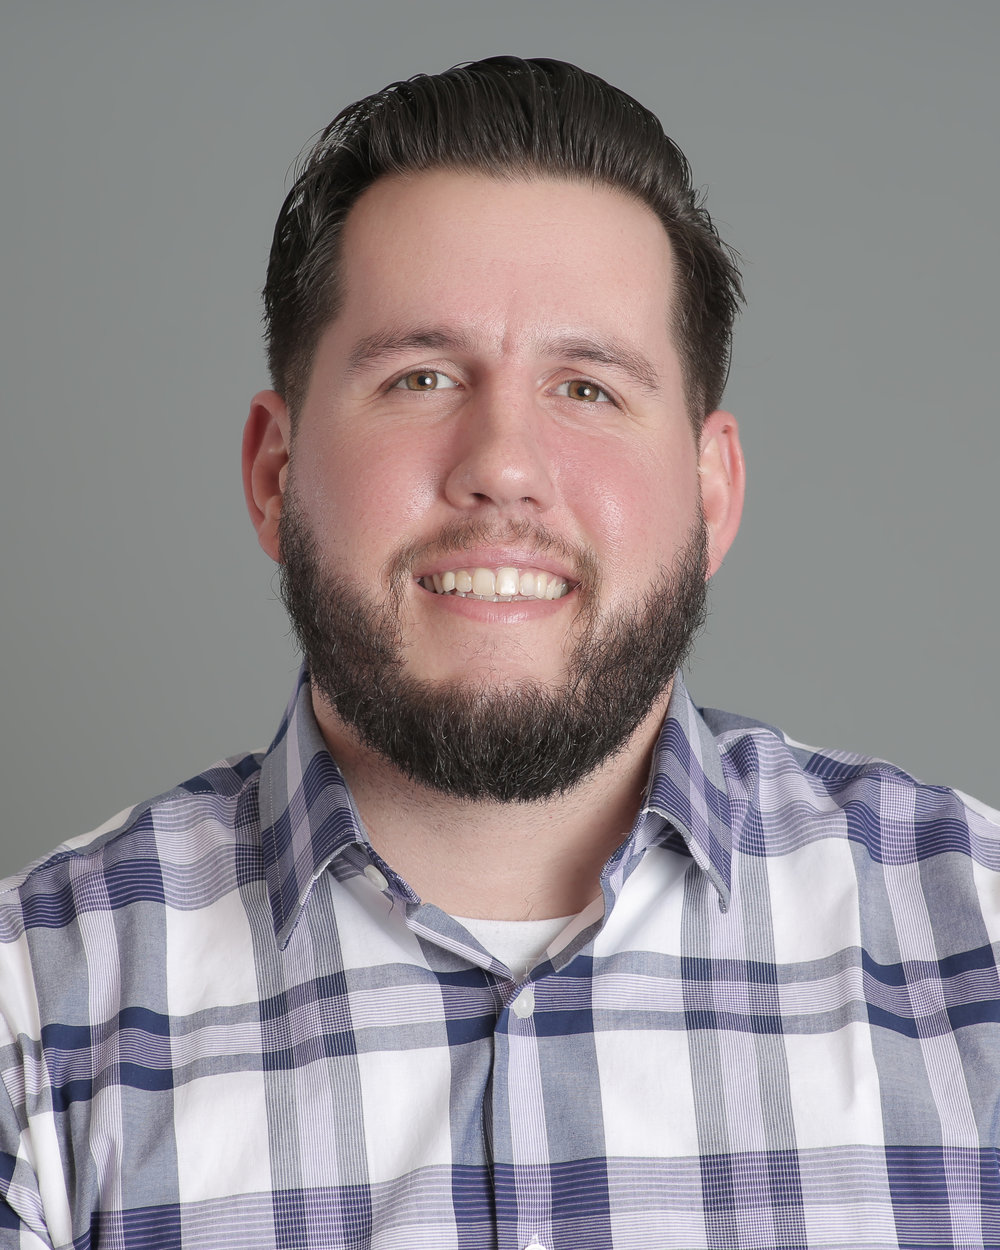 Jon Hill - Owner & Director of Installation